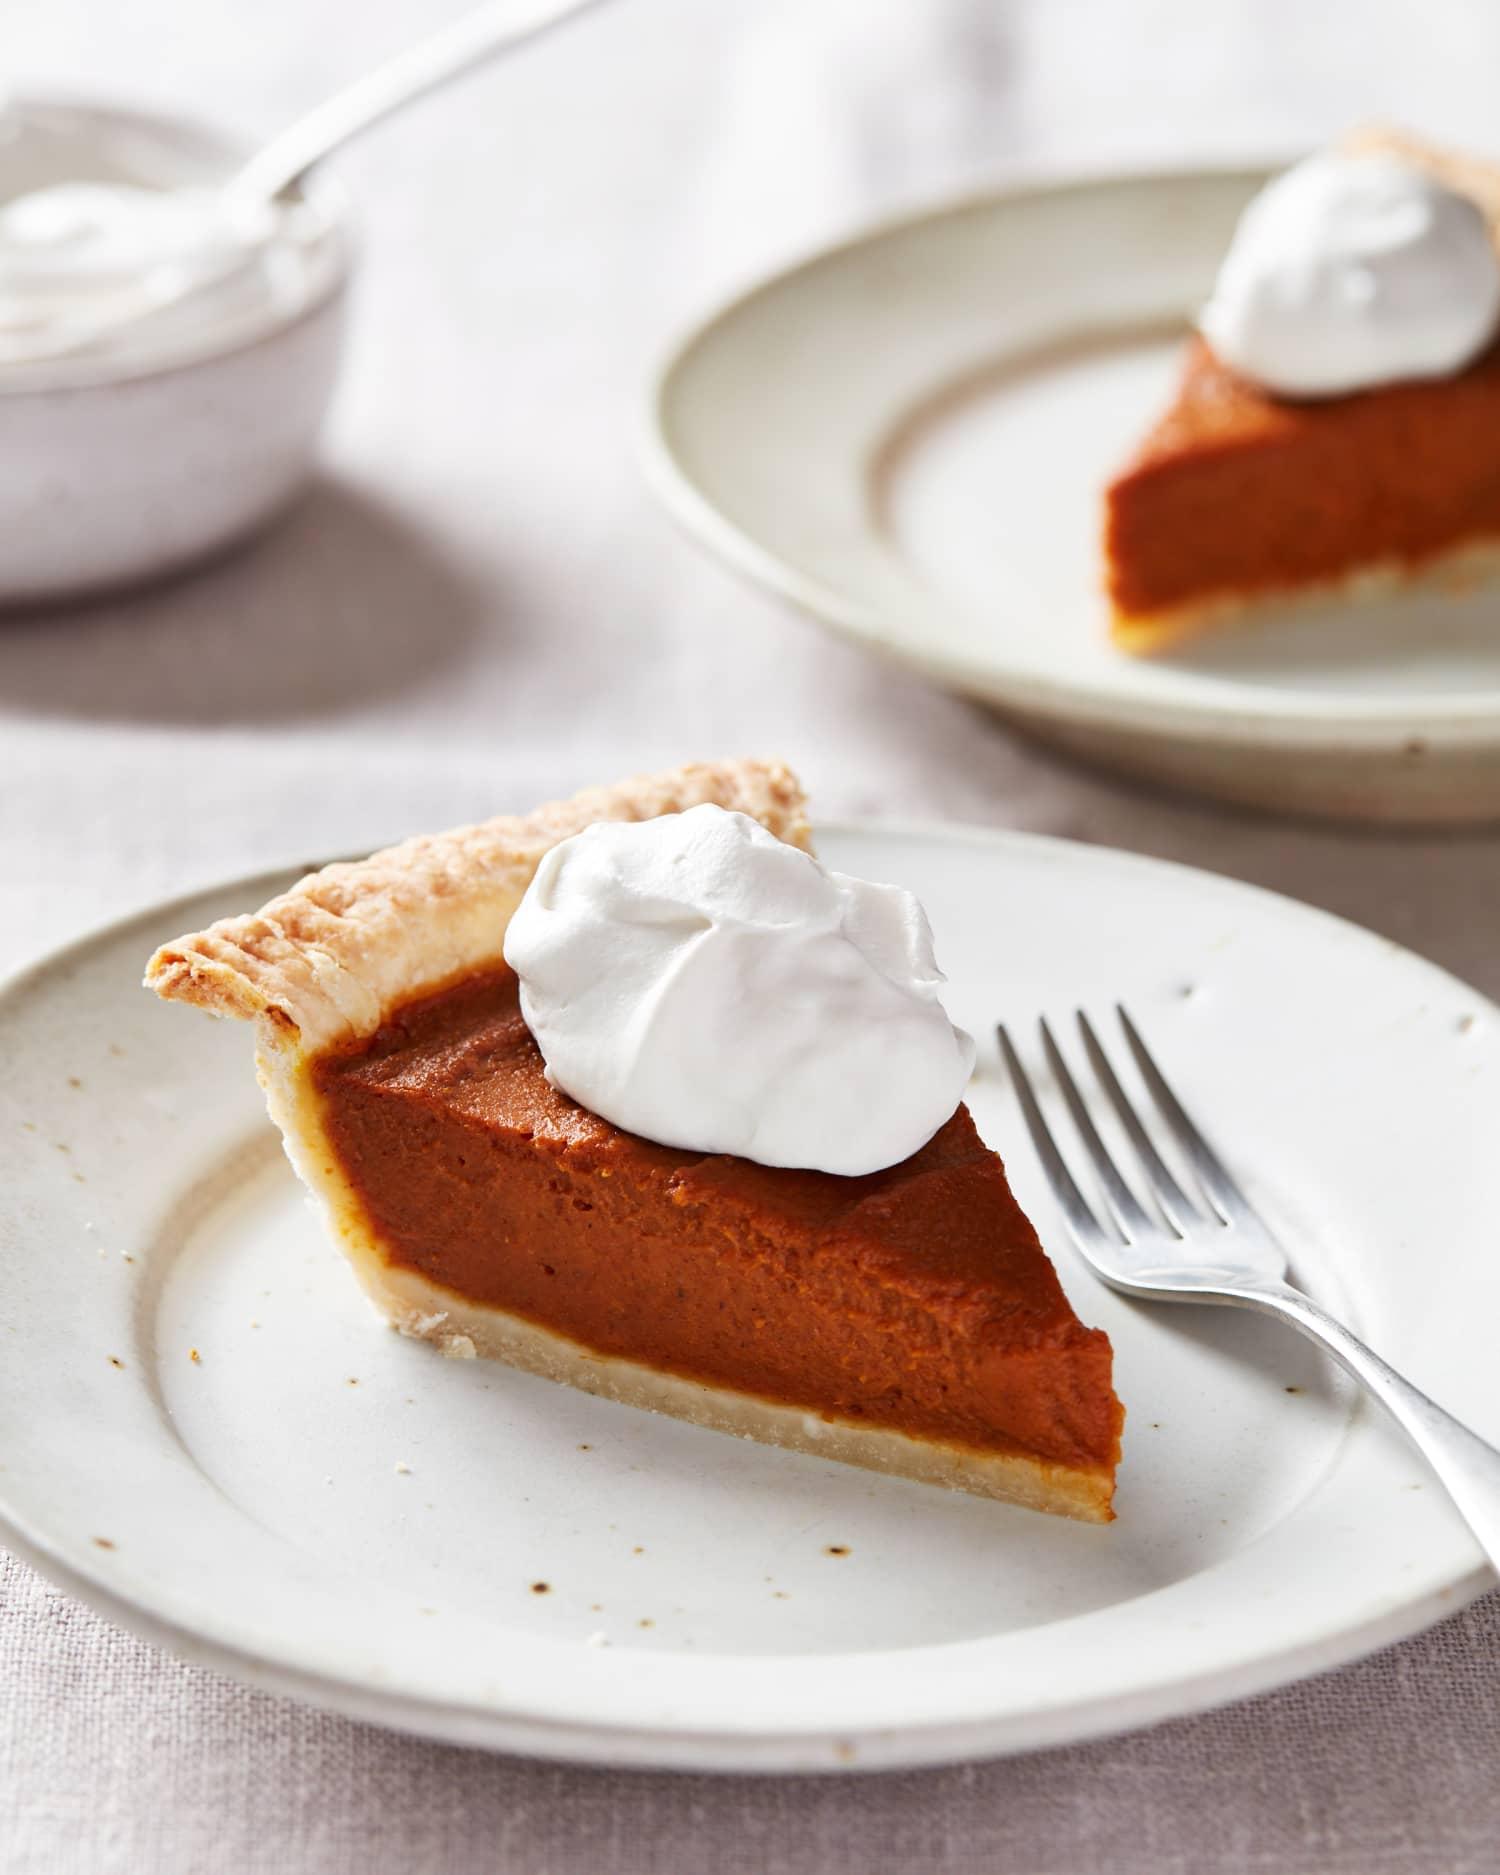 How To Make the Best Vegan Pumpkin Pie